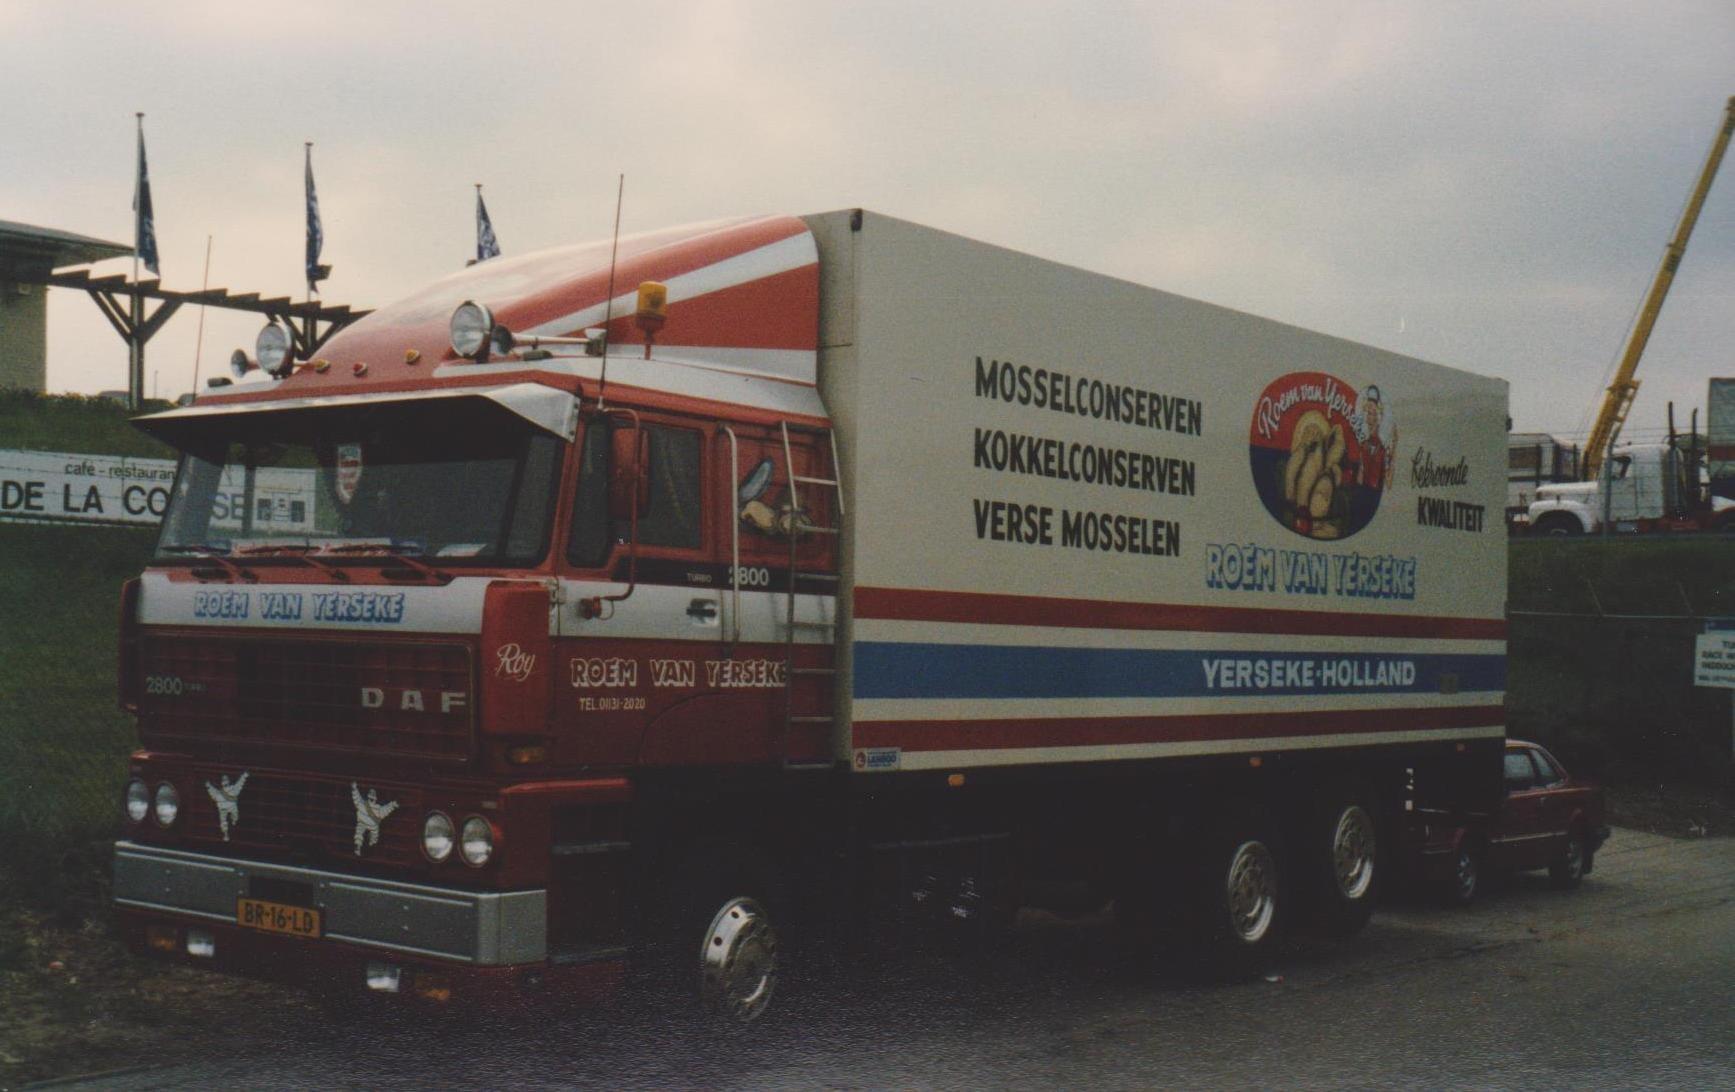 Daf-2800-Wim-Zijderveld-foto-(2)